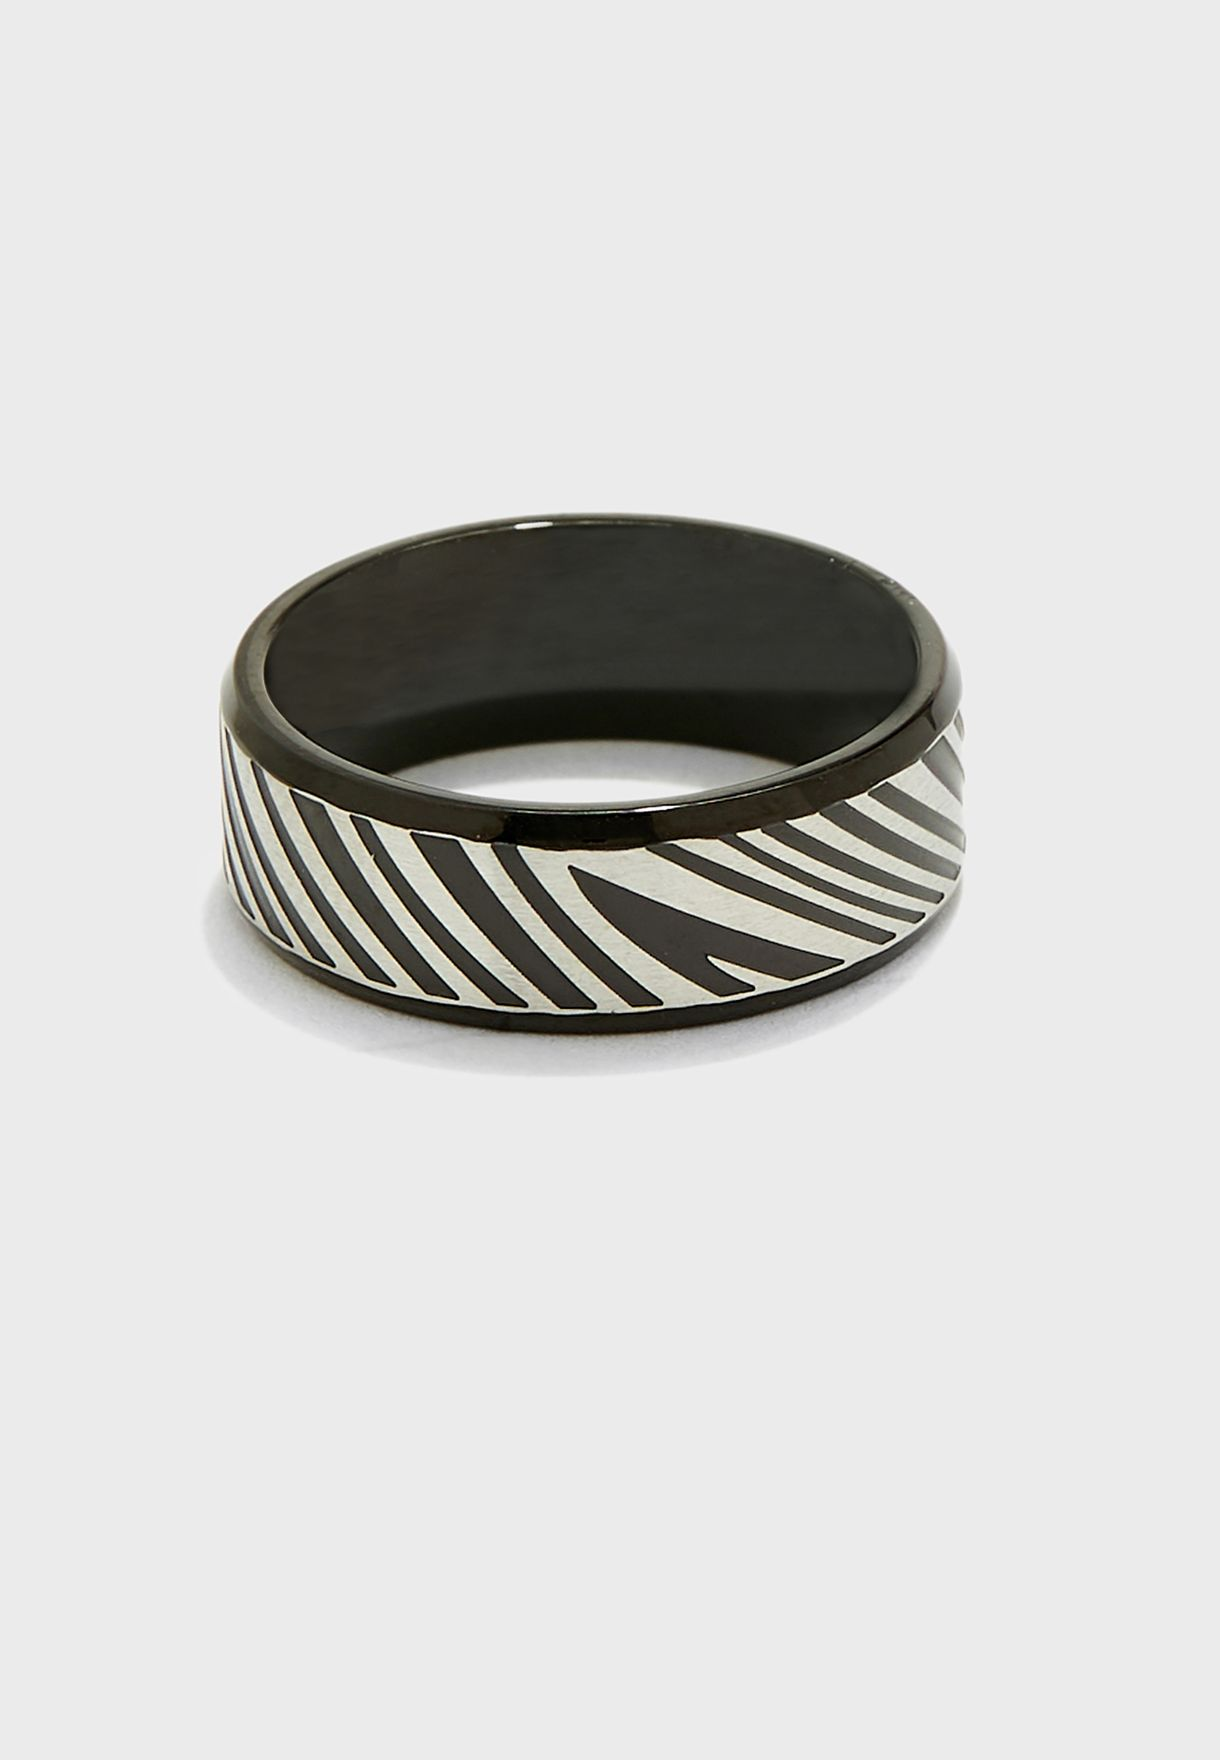 خاتم كاجوال سميك